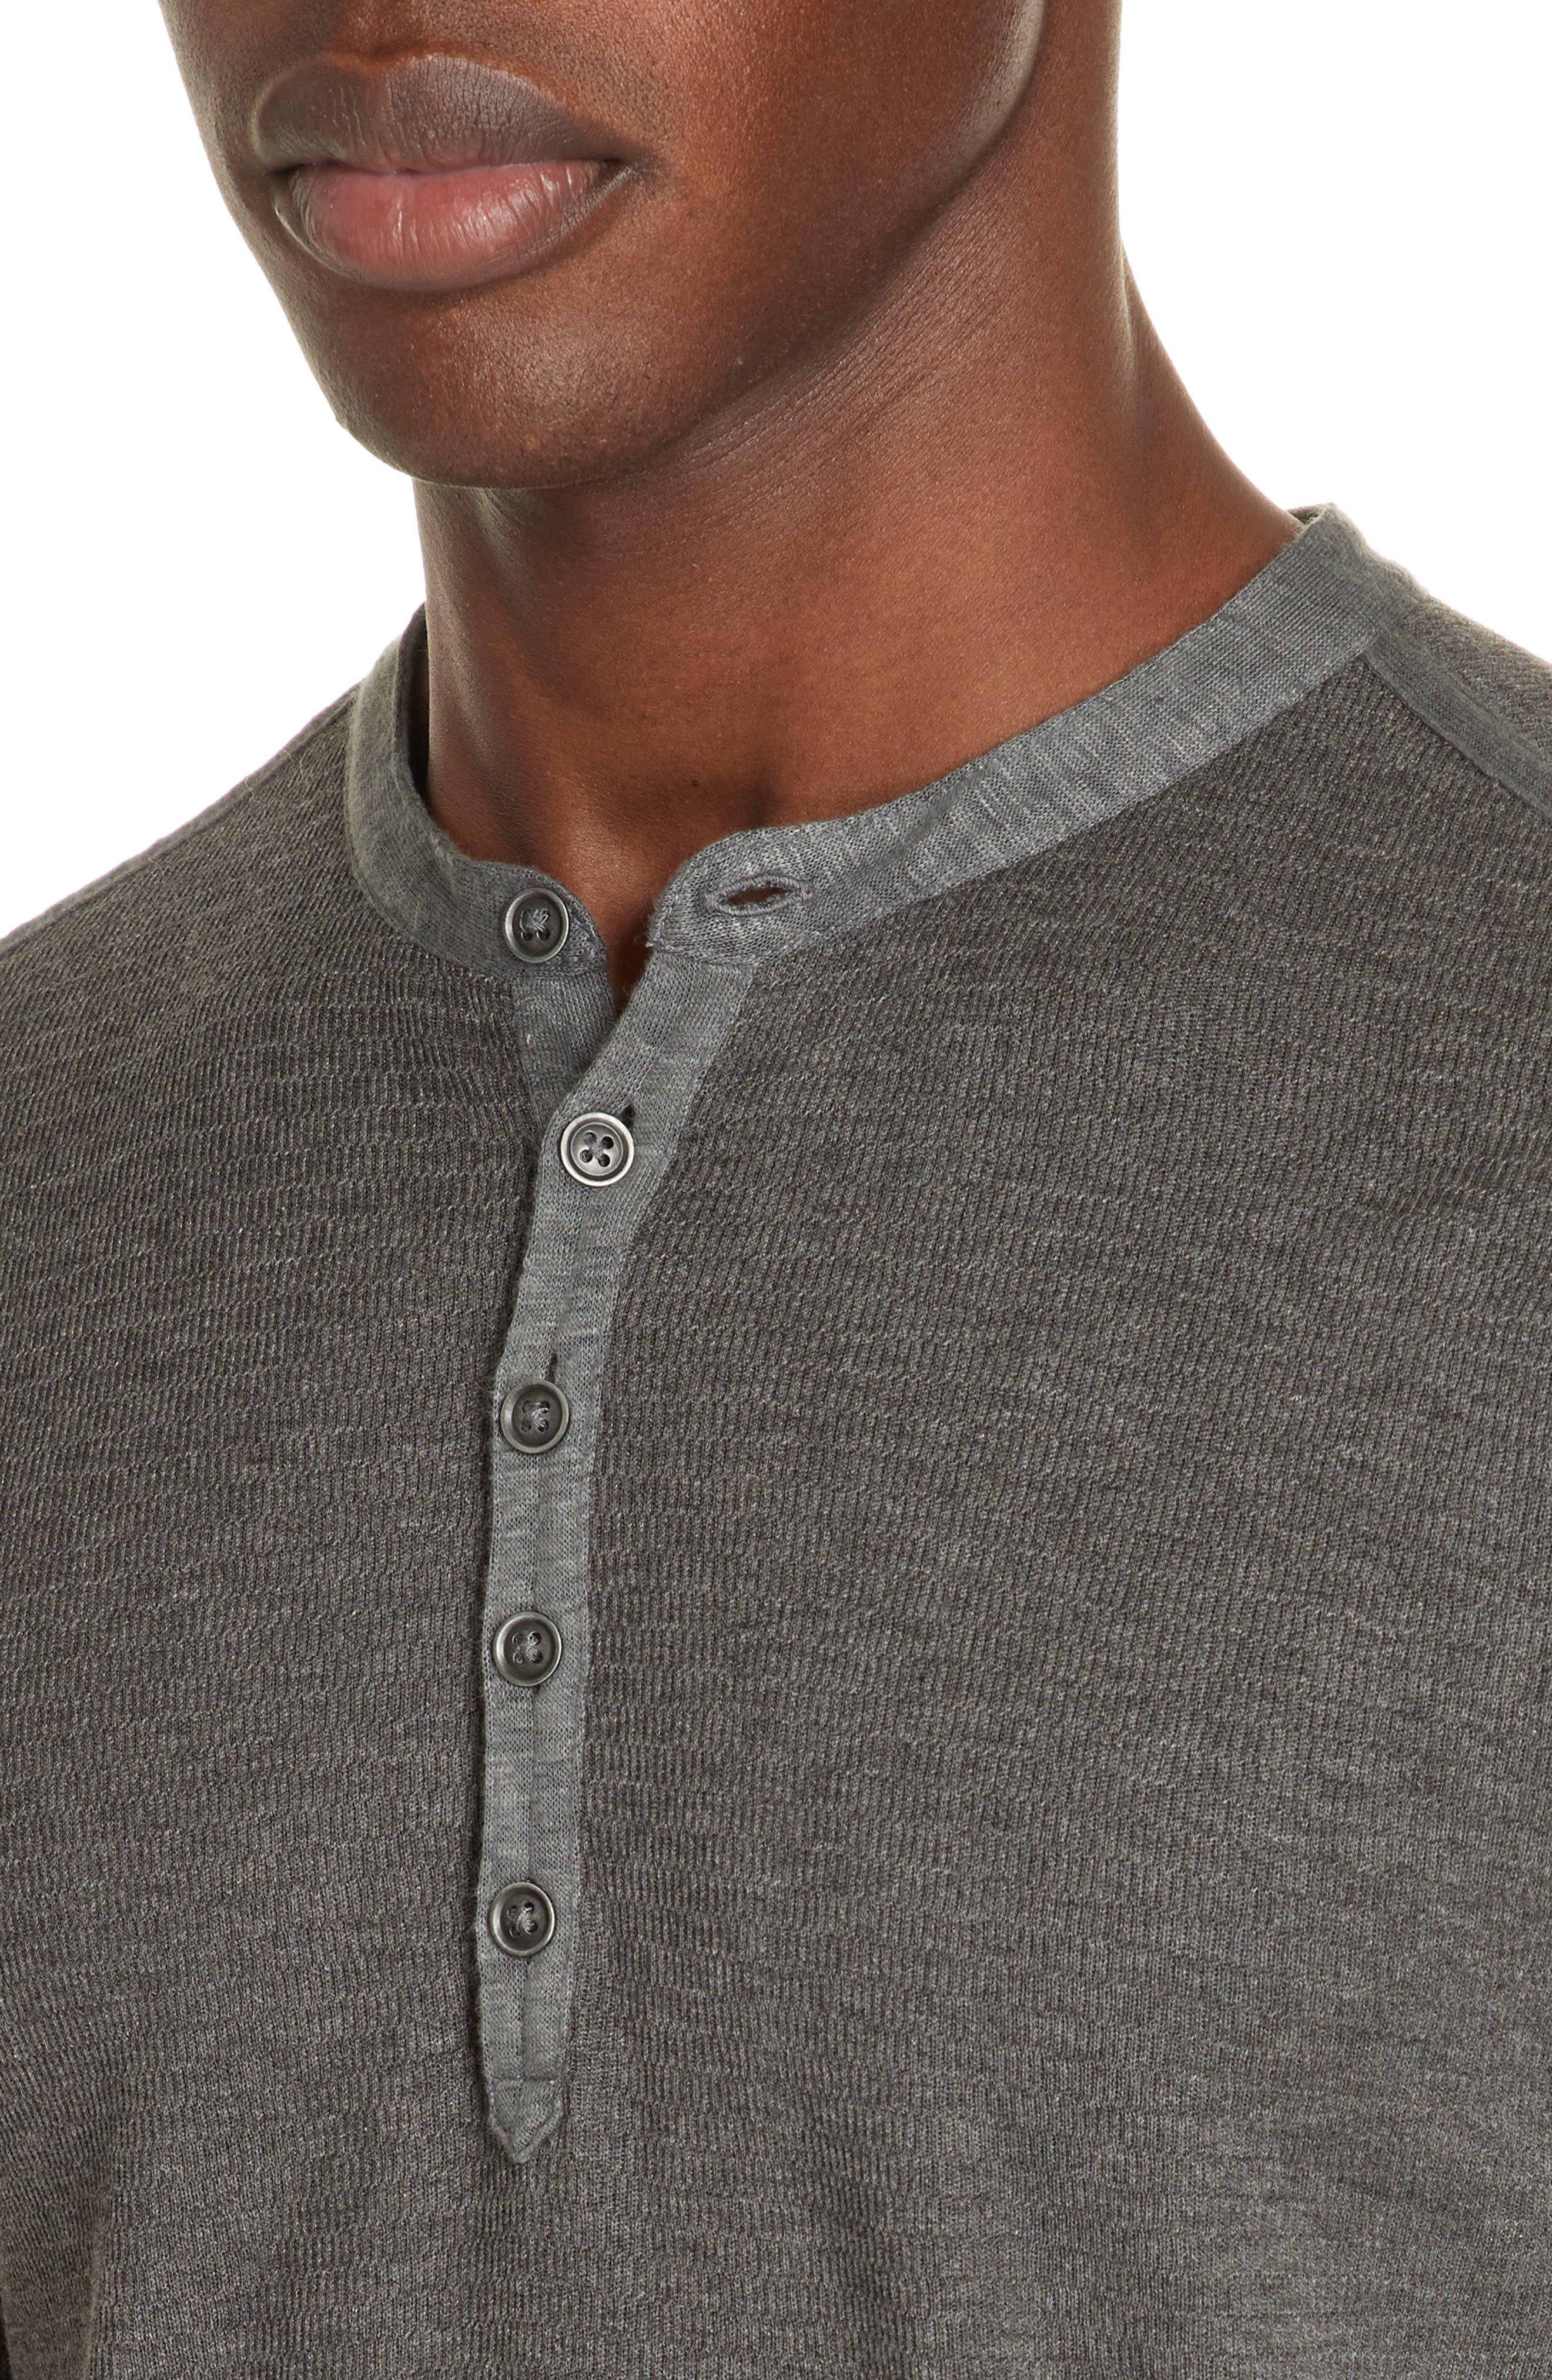 Henley Shirt,                             Alternate thumbnail 2, color,                             001